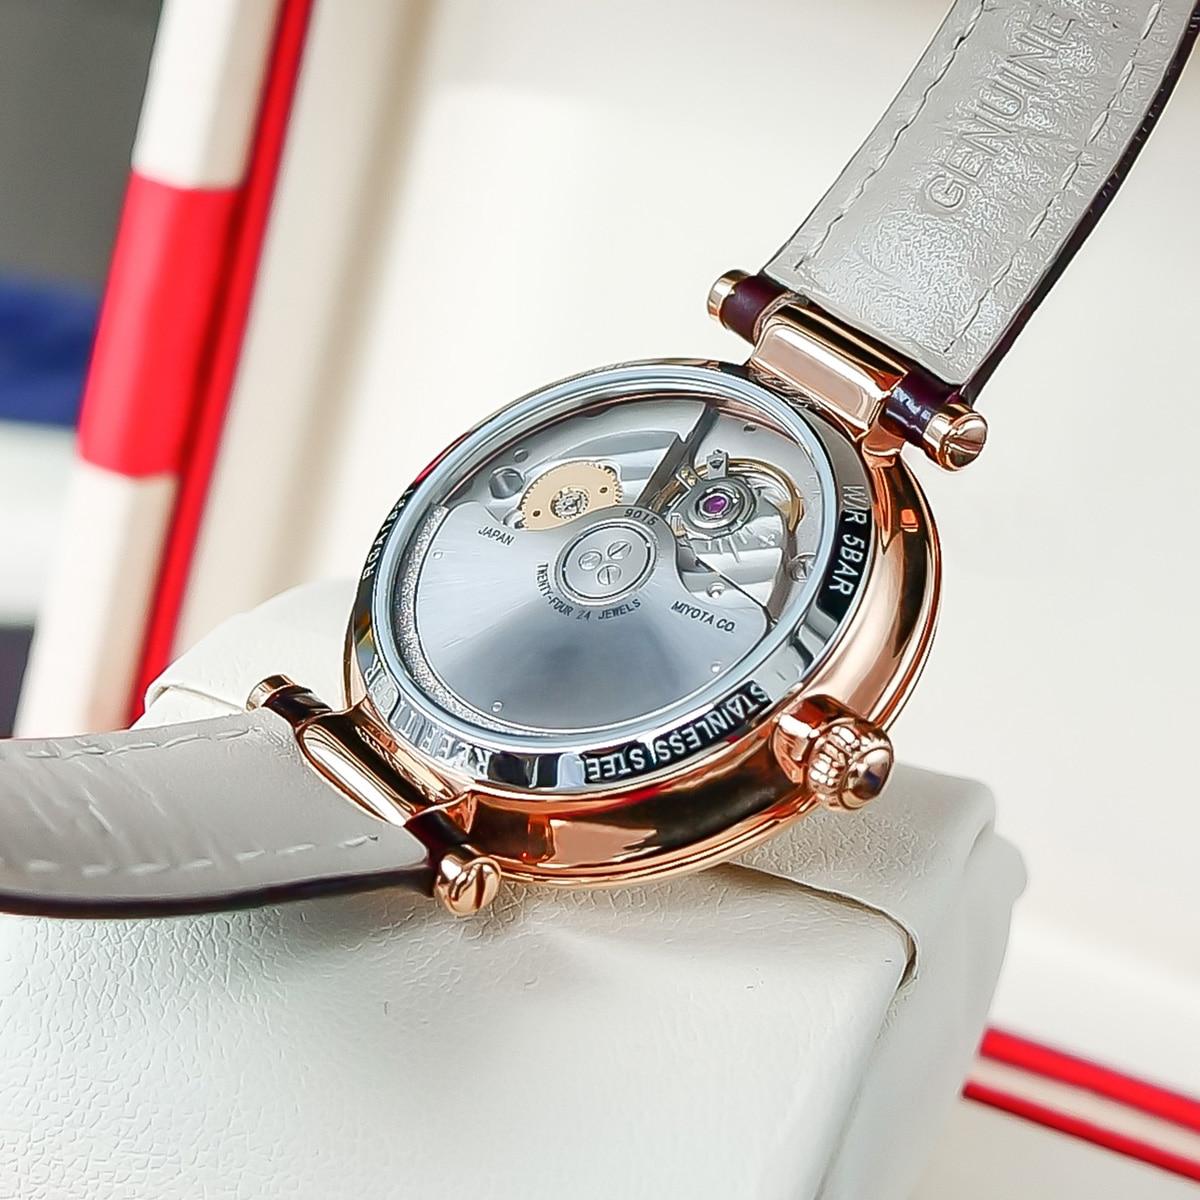 Reef Tiger/RT Luxury Automatic Mechanical Watch Steel Ladies Date Leather Band Relogio Feminino RGA1595 enlarge